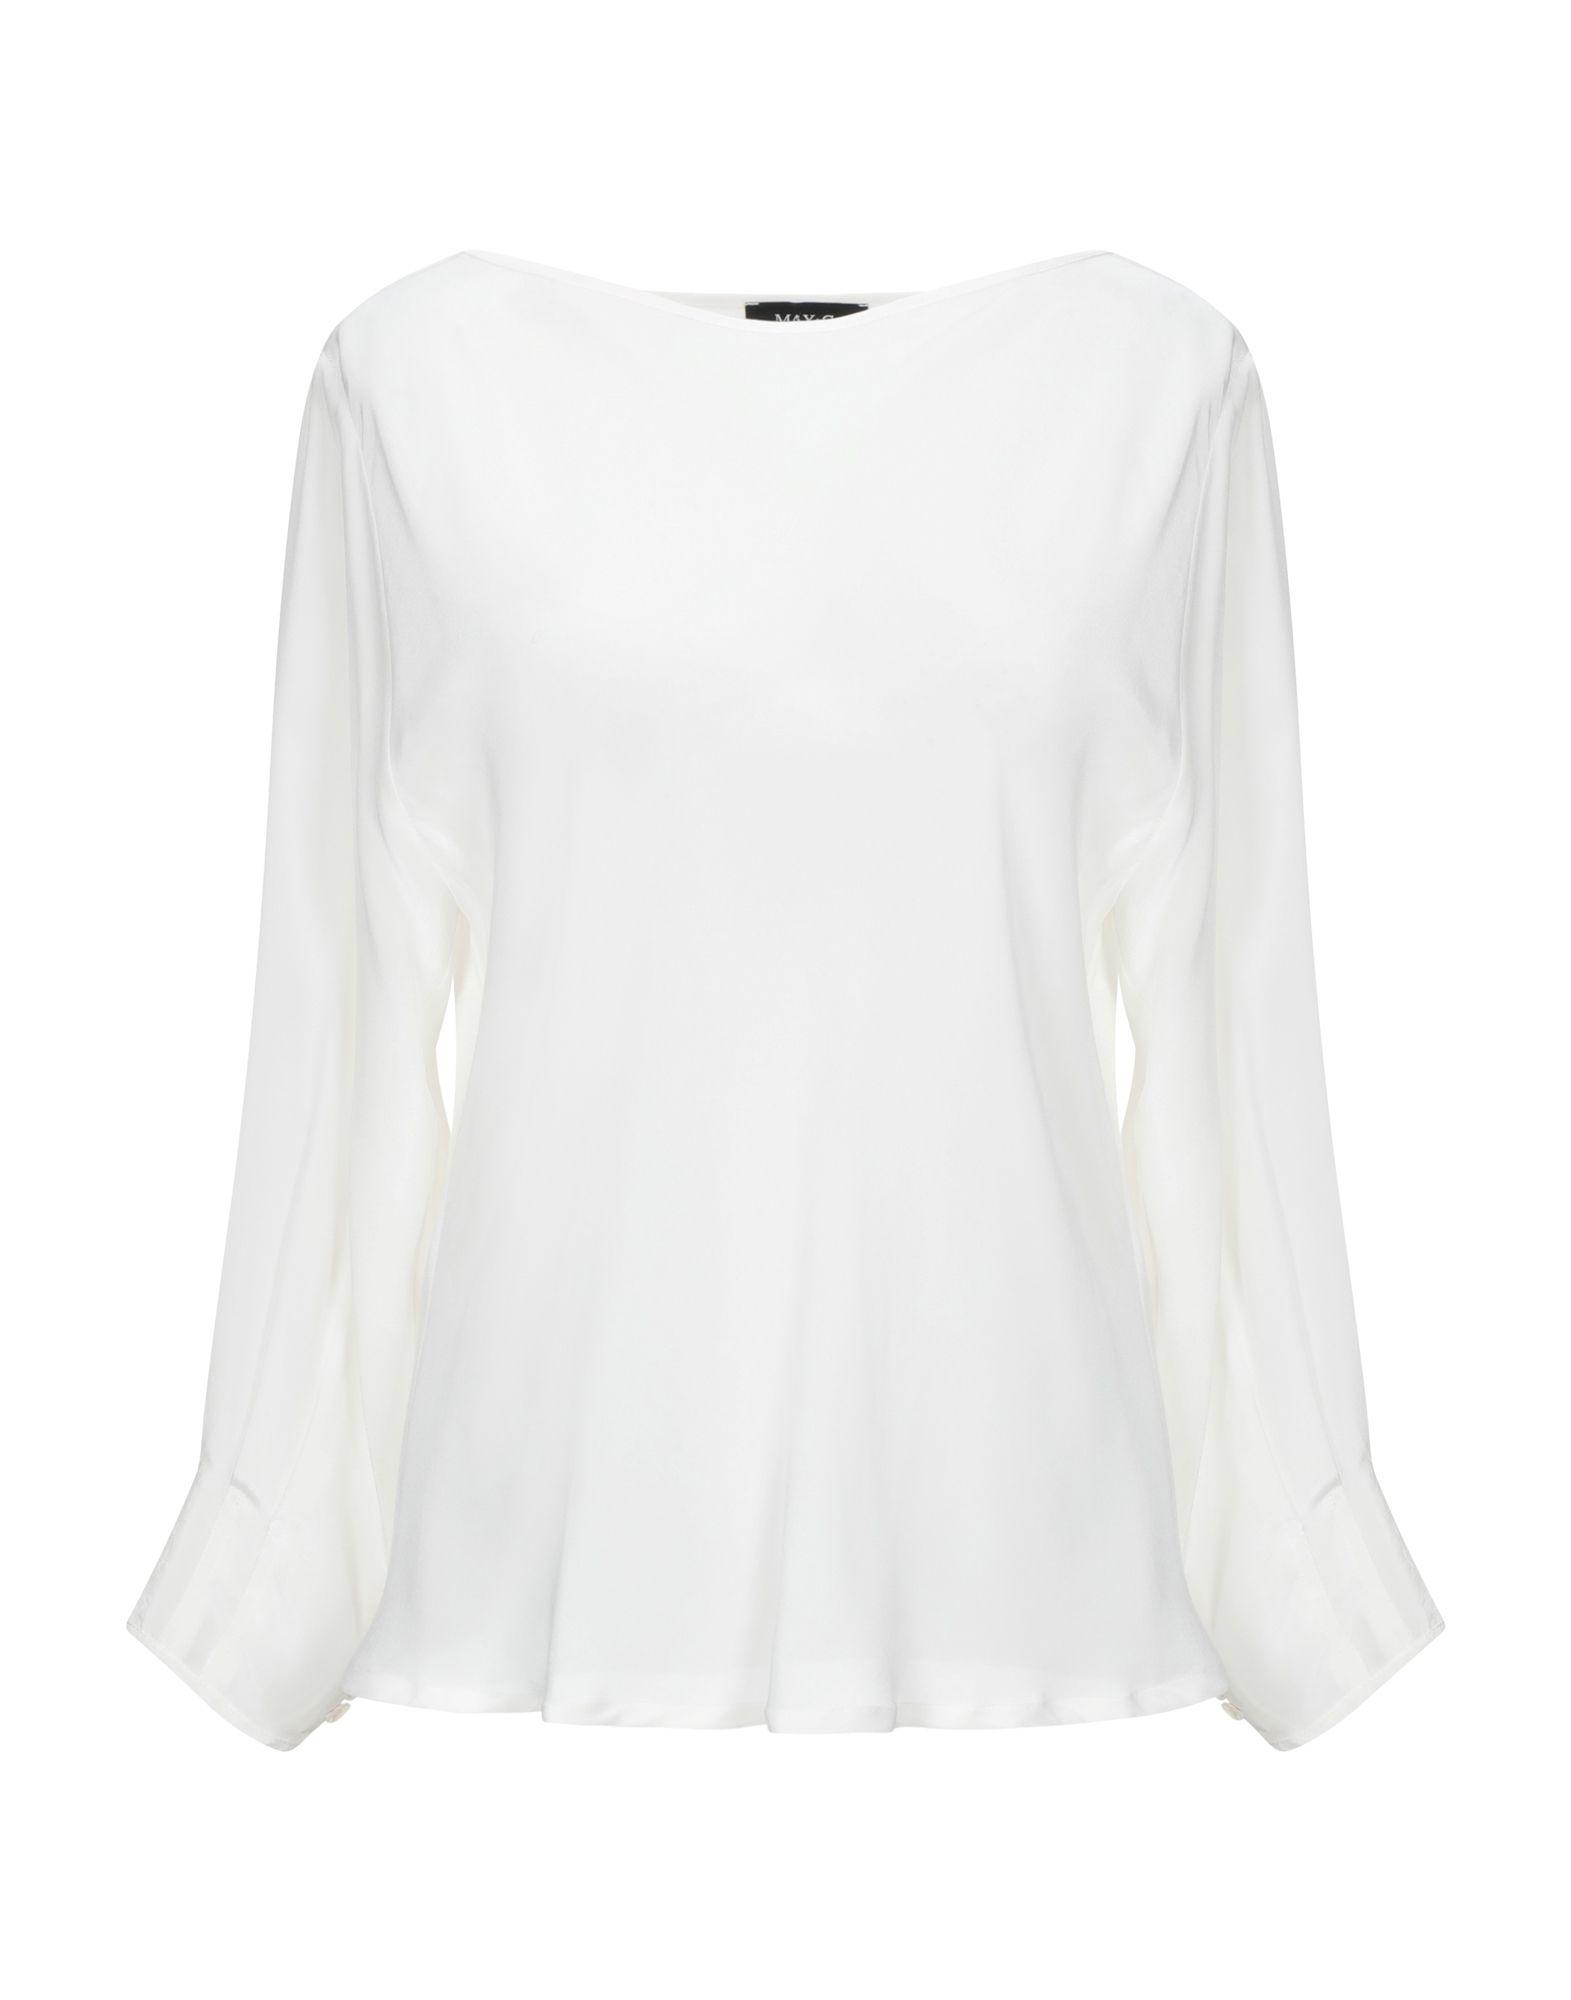 MAX & CO. Блузка co te блузка